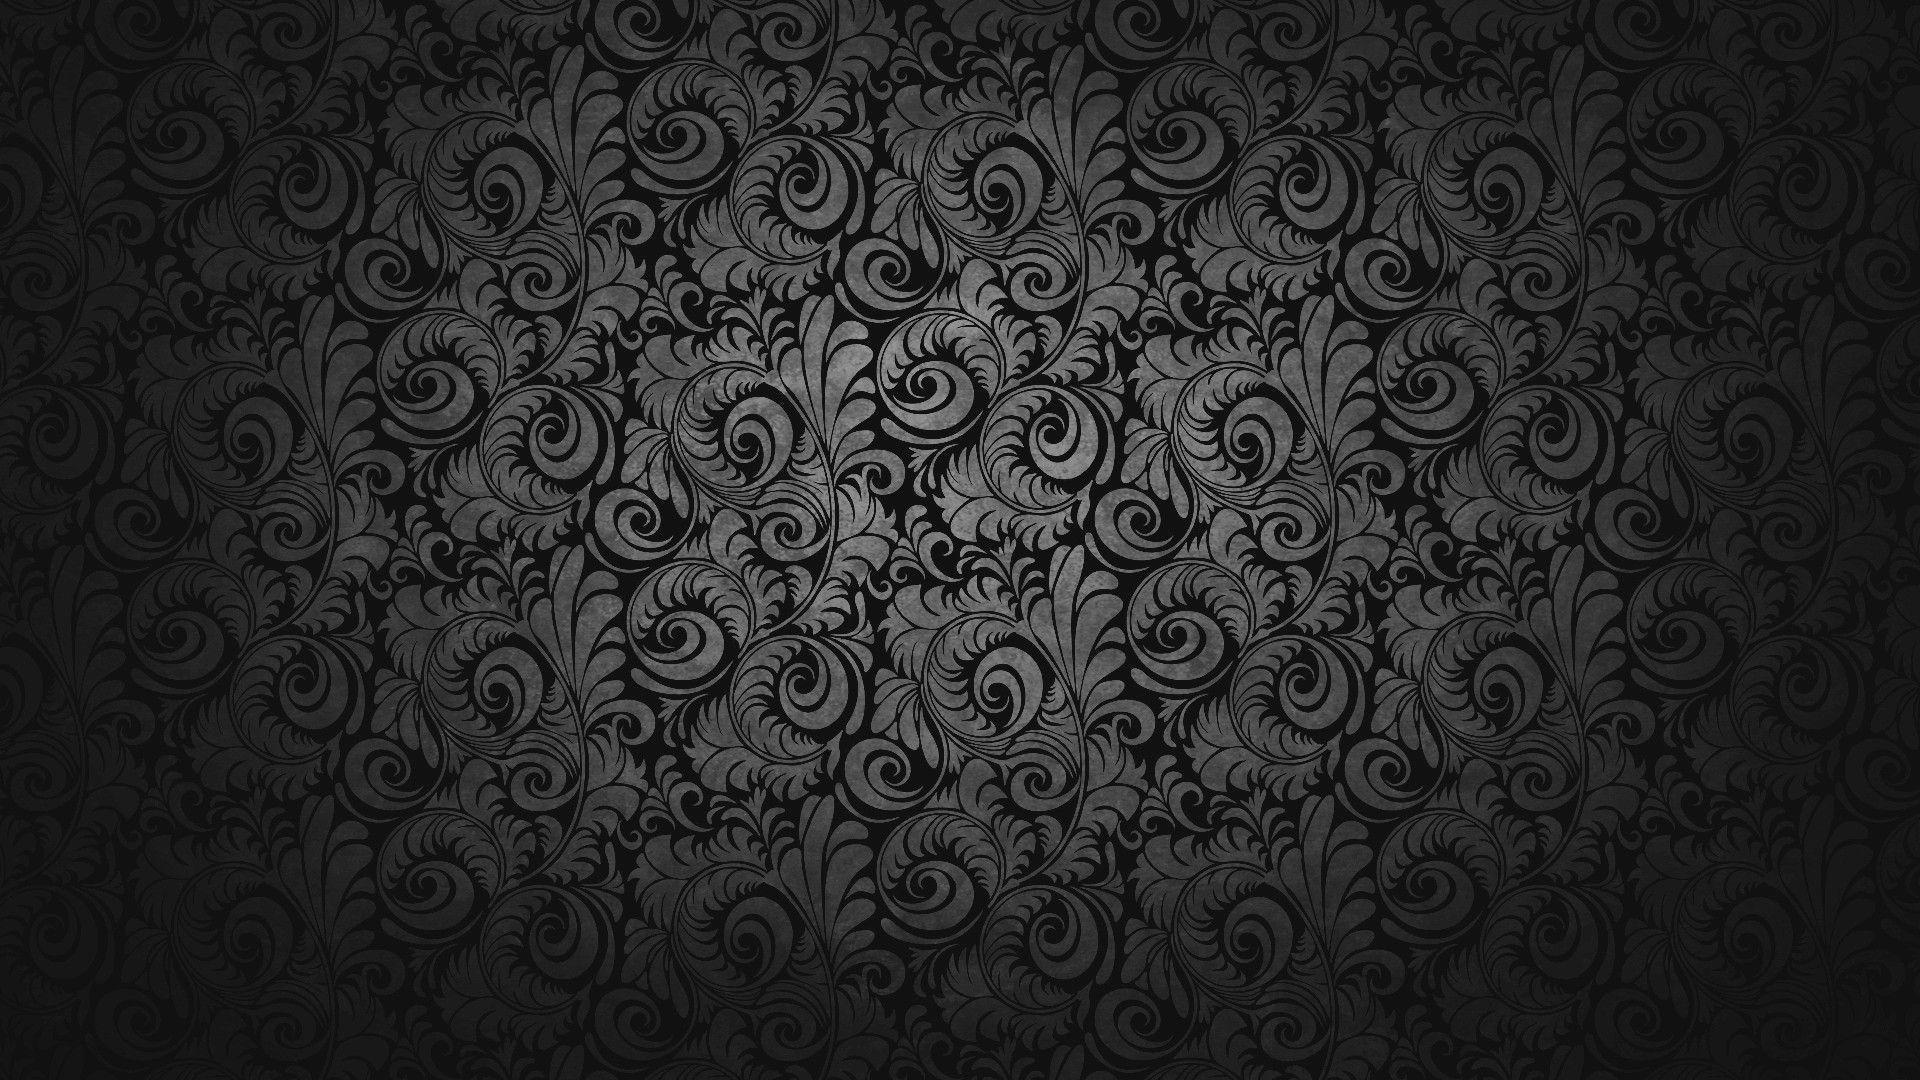 Dark Abstract Wallpaper 1080p